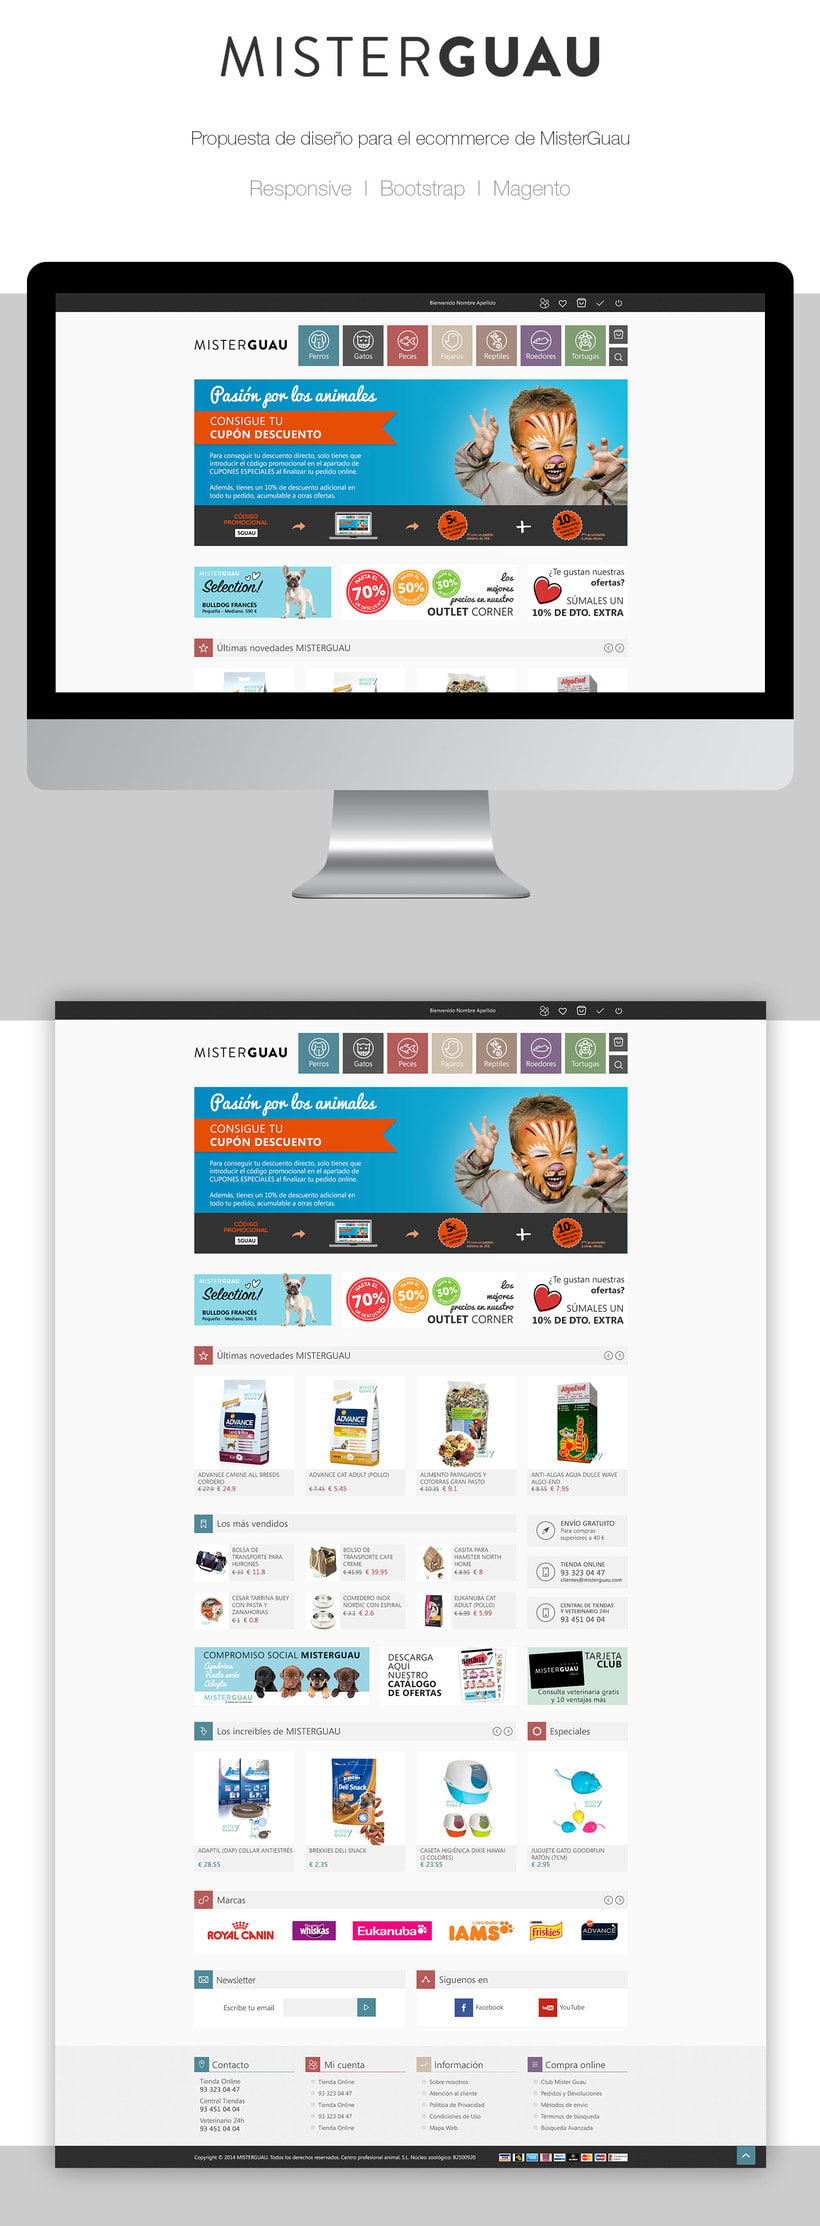 MisterGuau | Ecommerce website concept -1